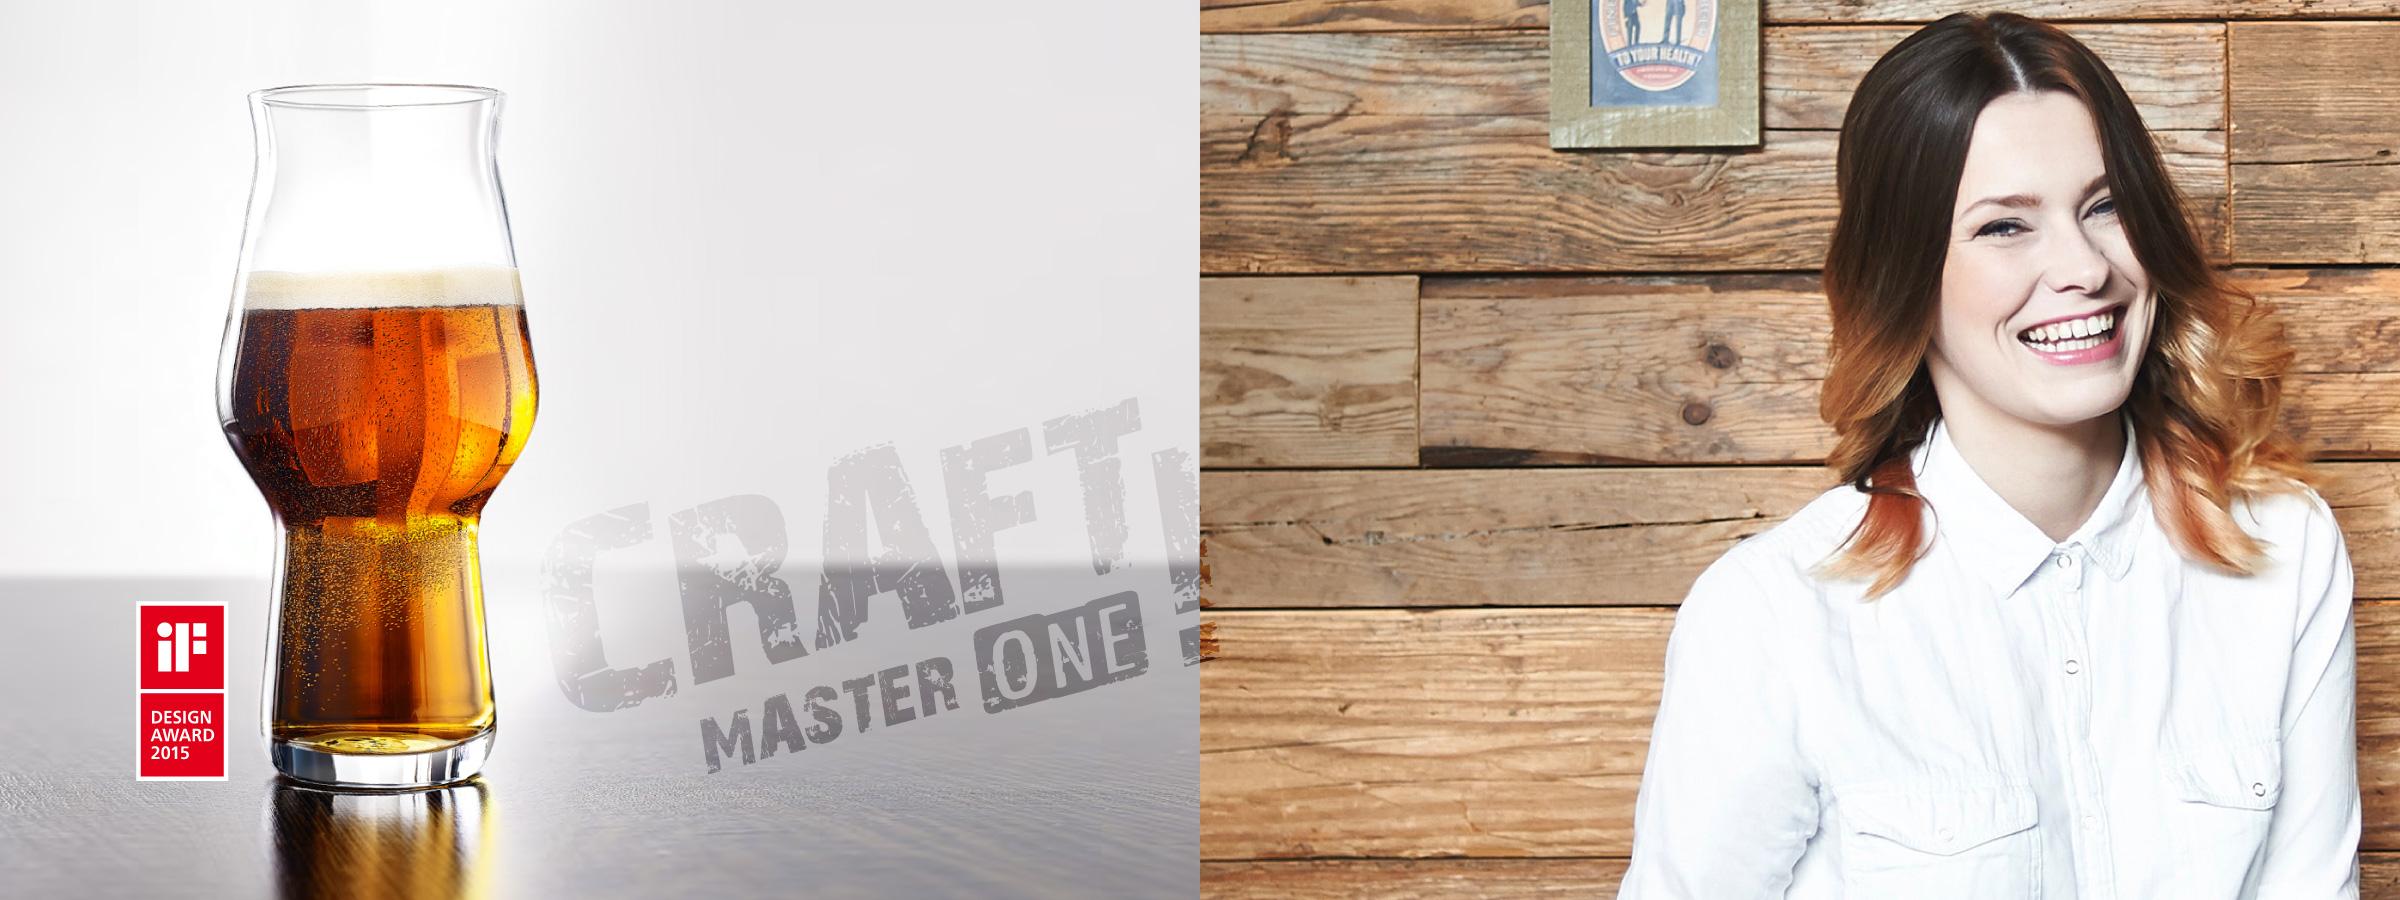 Craft Master One